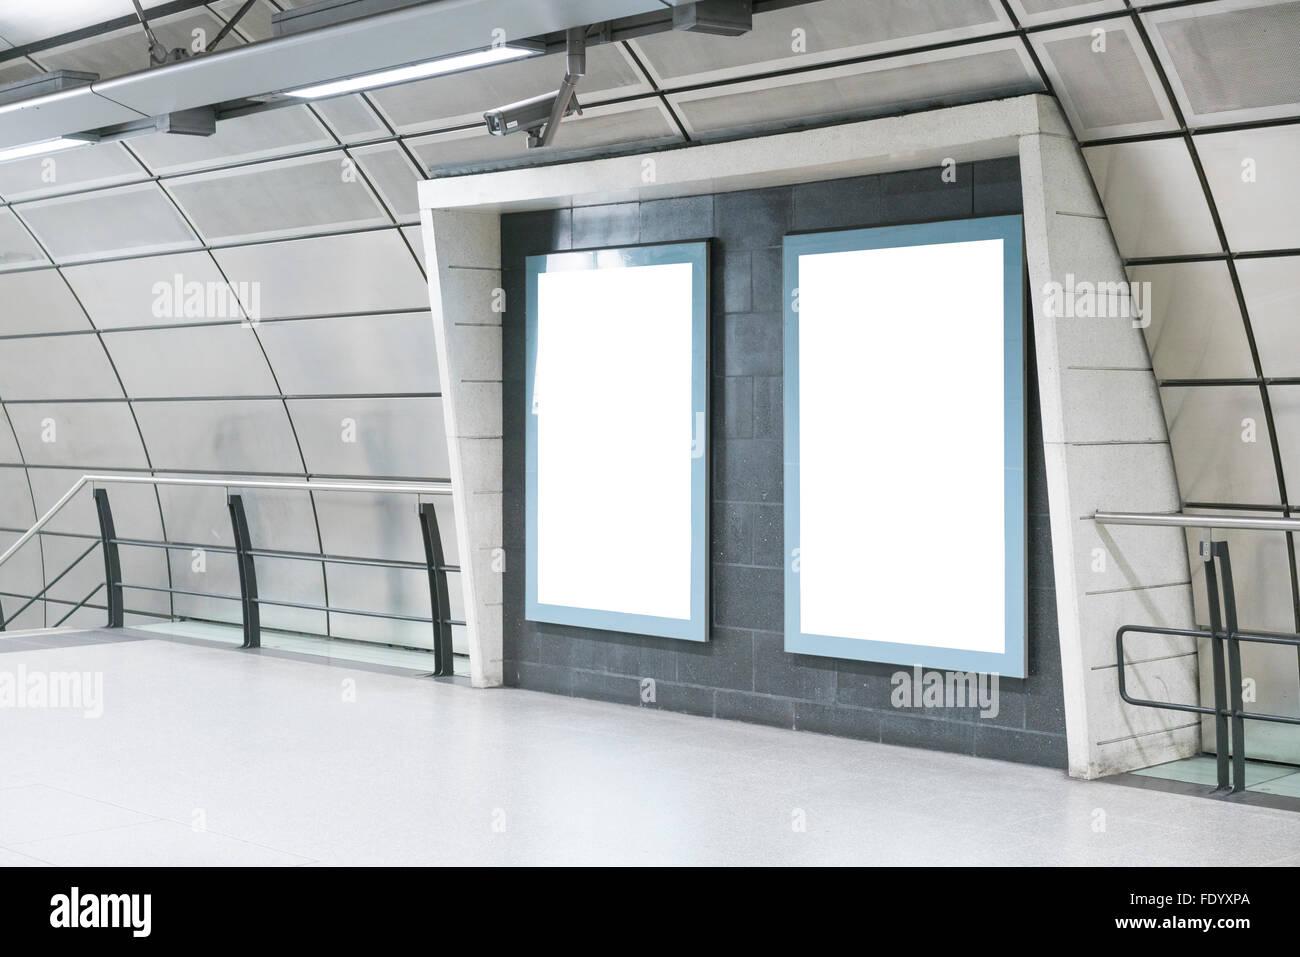 BLANK TEMPLATE BILLBOARD POSTER ON LONDON UNDERGROUND METRO, LONDON, UNITED KINGDOM, HIGH QUALITY - Stock Image